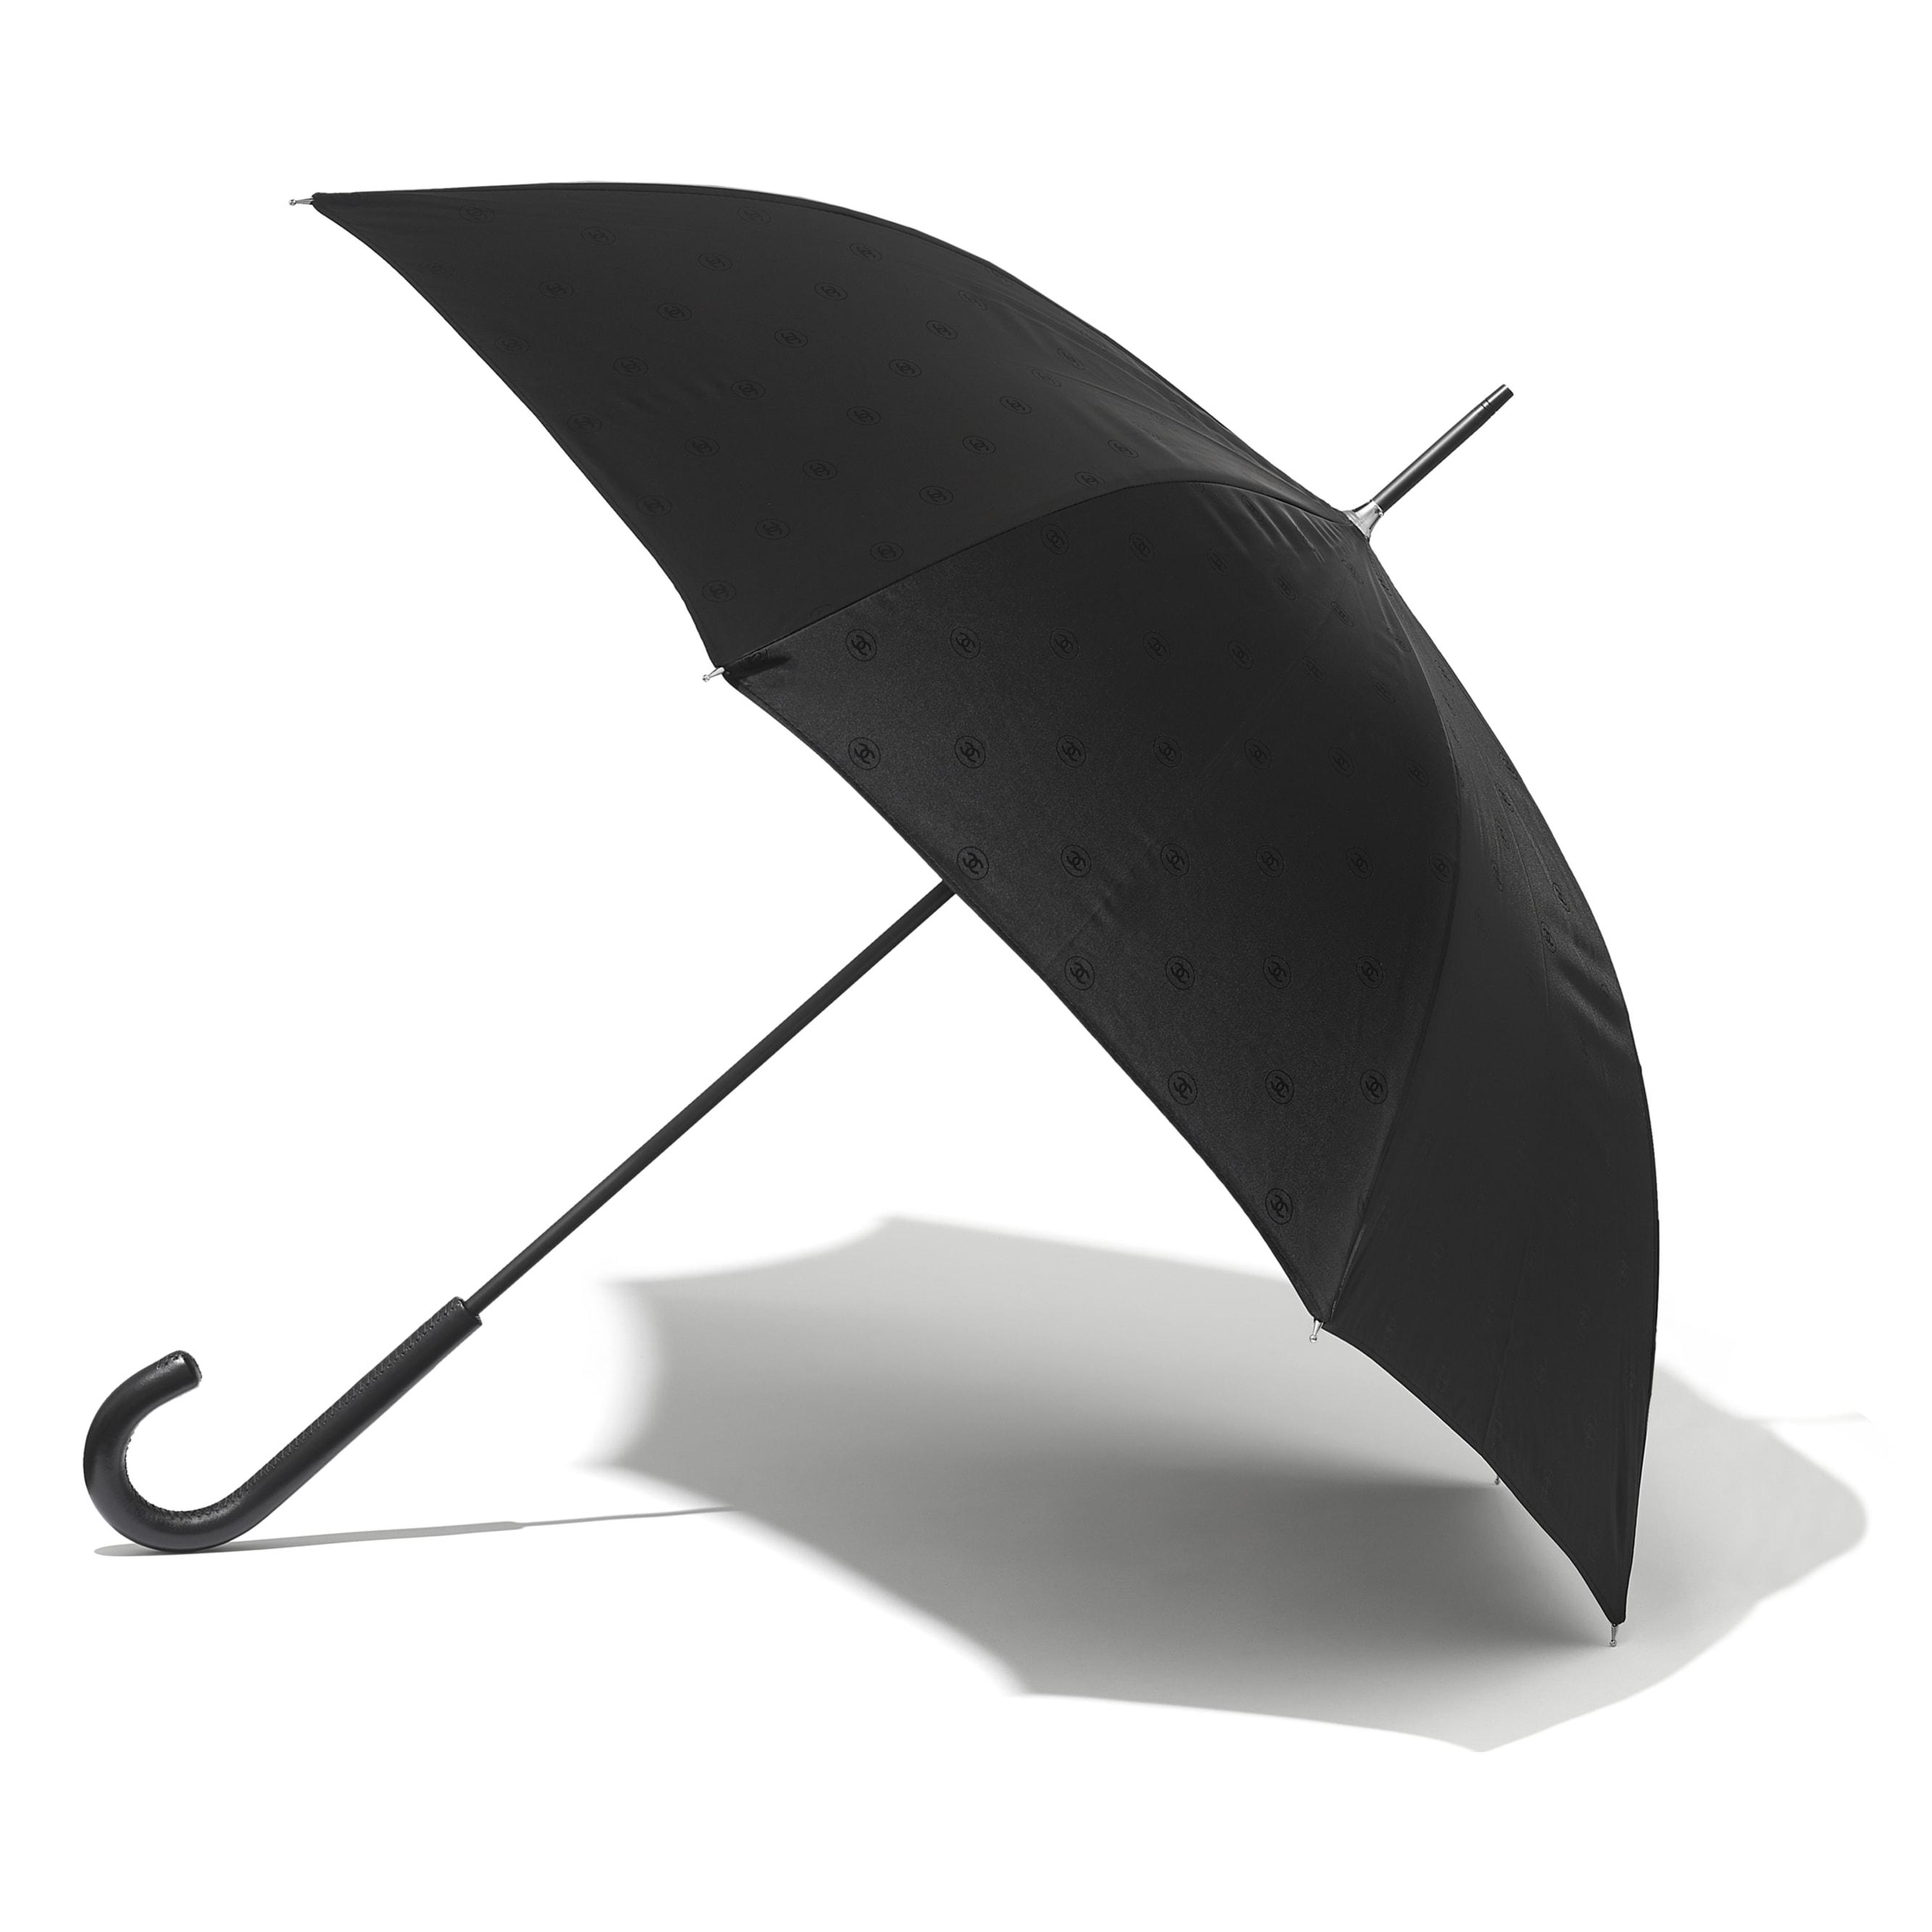 Umbrella - Black - Synthetic Fibers & Calfskin - CHANEL - Alternative view - see standard sized version